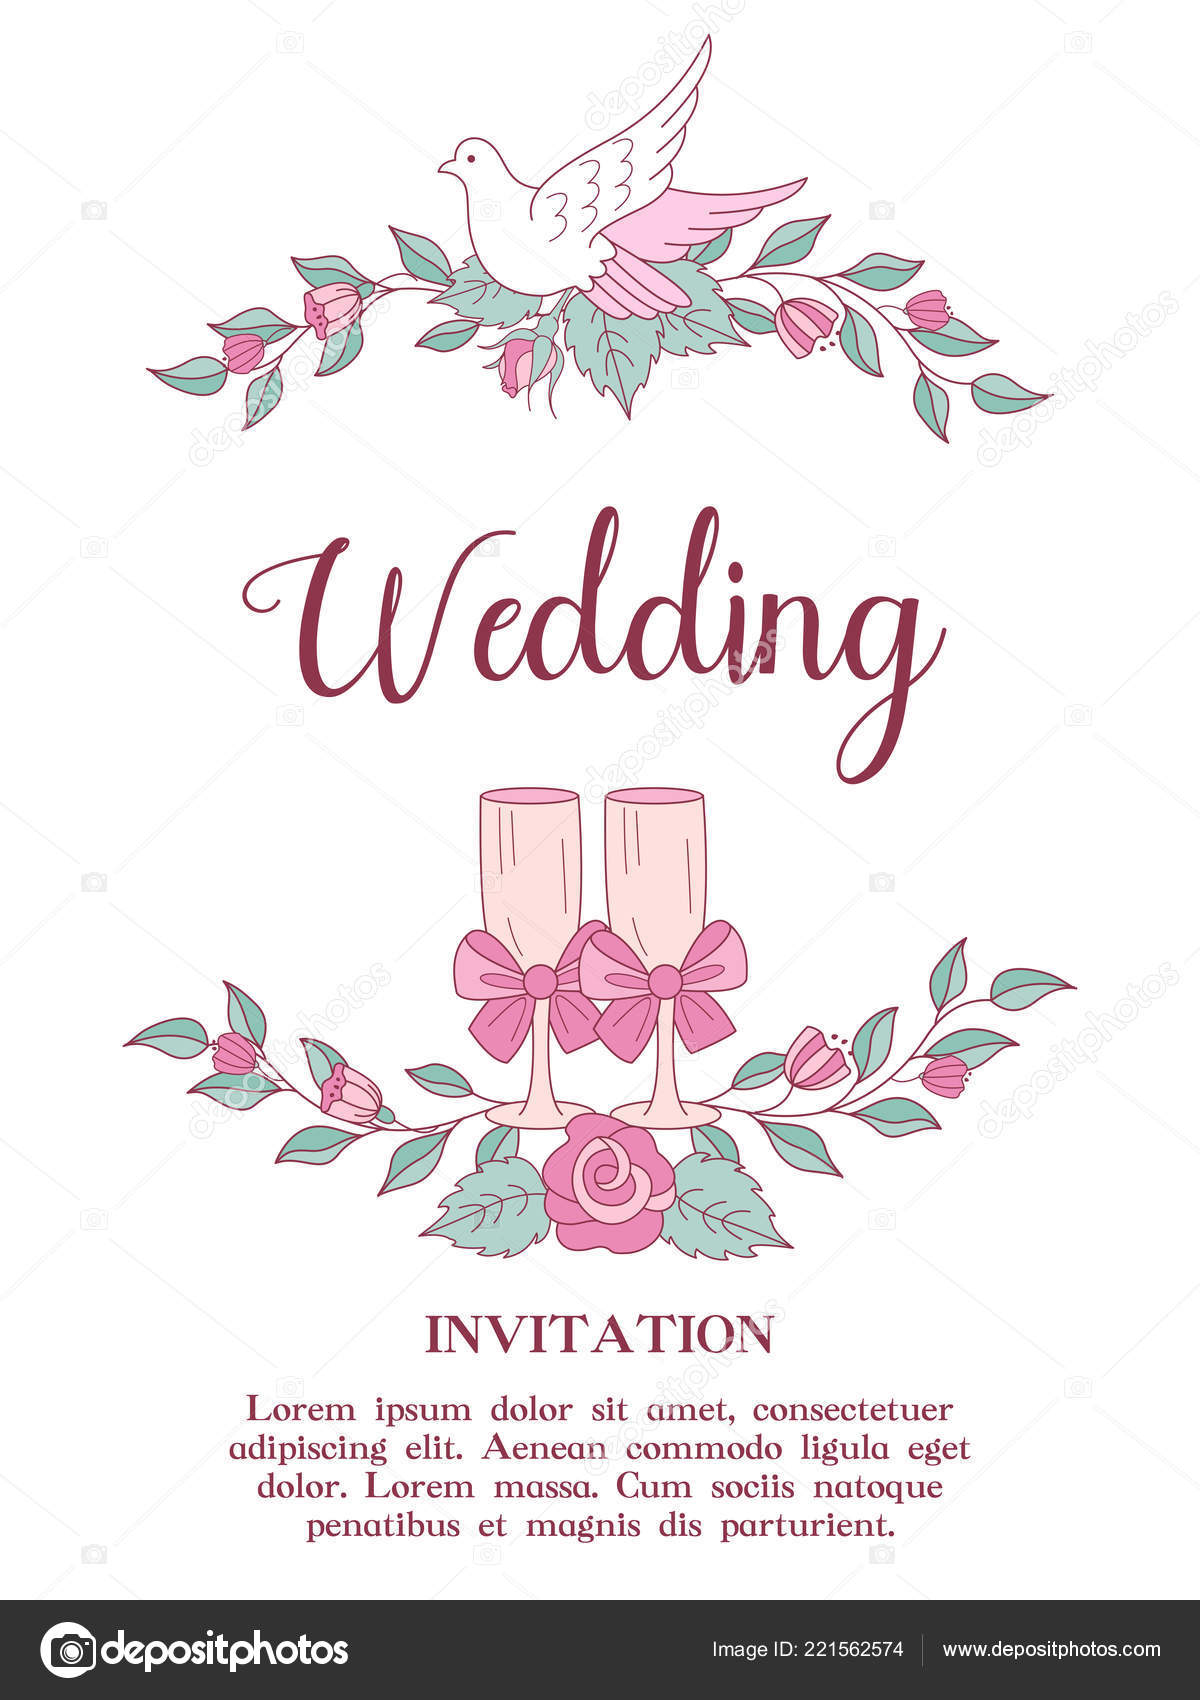 Wedding Invitation Happy Weddings Wreaths Pink Wedding Flowers White